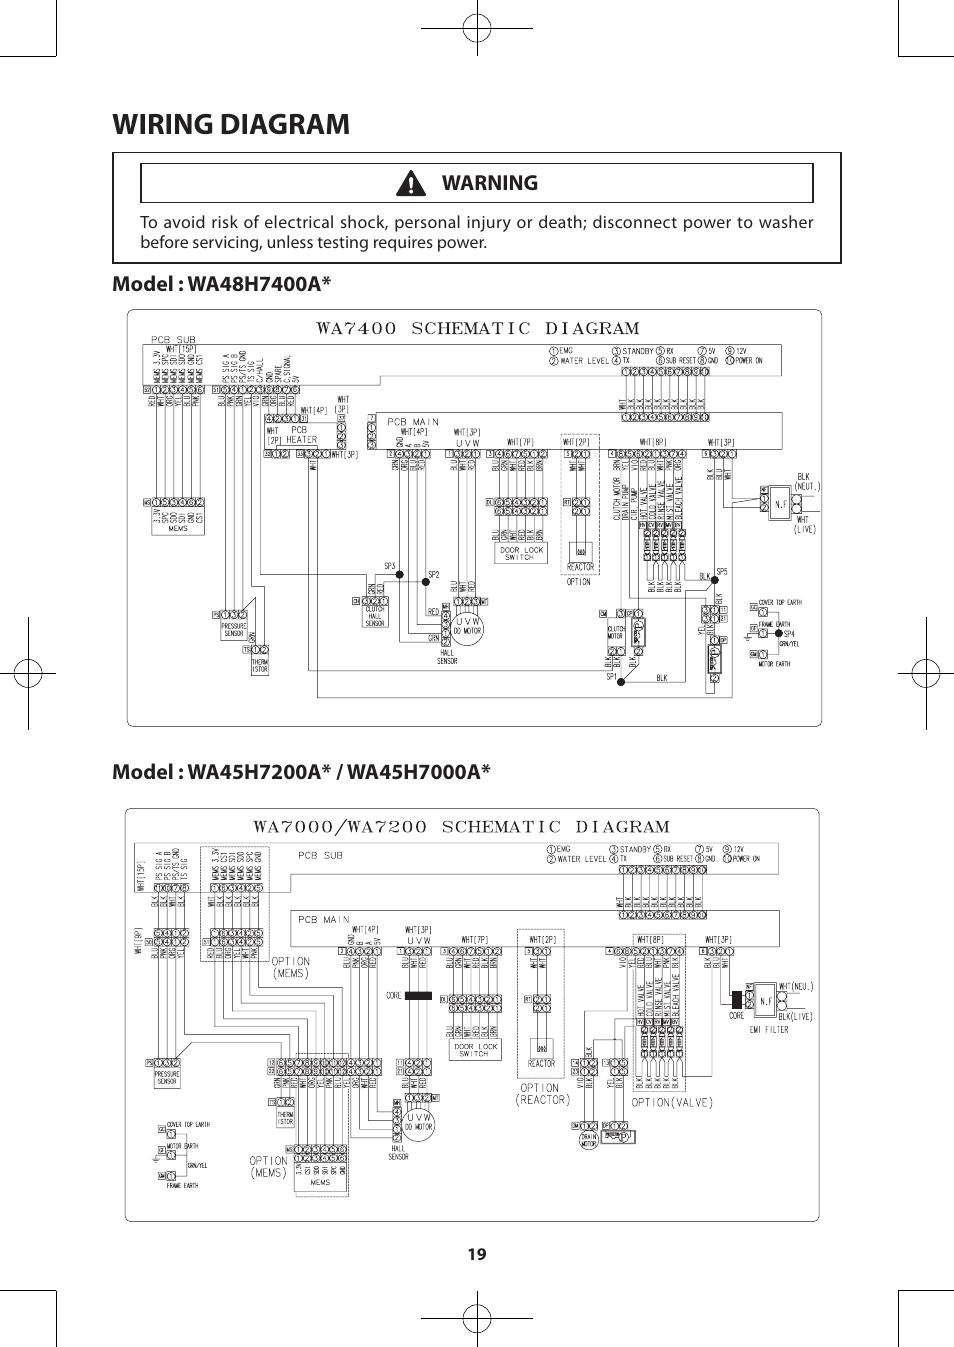 audi a2 wiring diagram robertshaw st thermostat 1t schwabenschamanen de samsung wa48h7400aw user manual page 19 60 rh manualsdir com dv40j3000ew dji